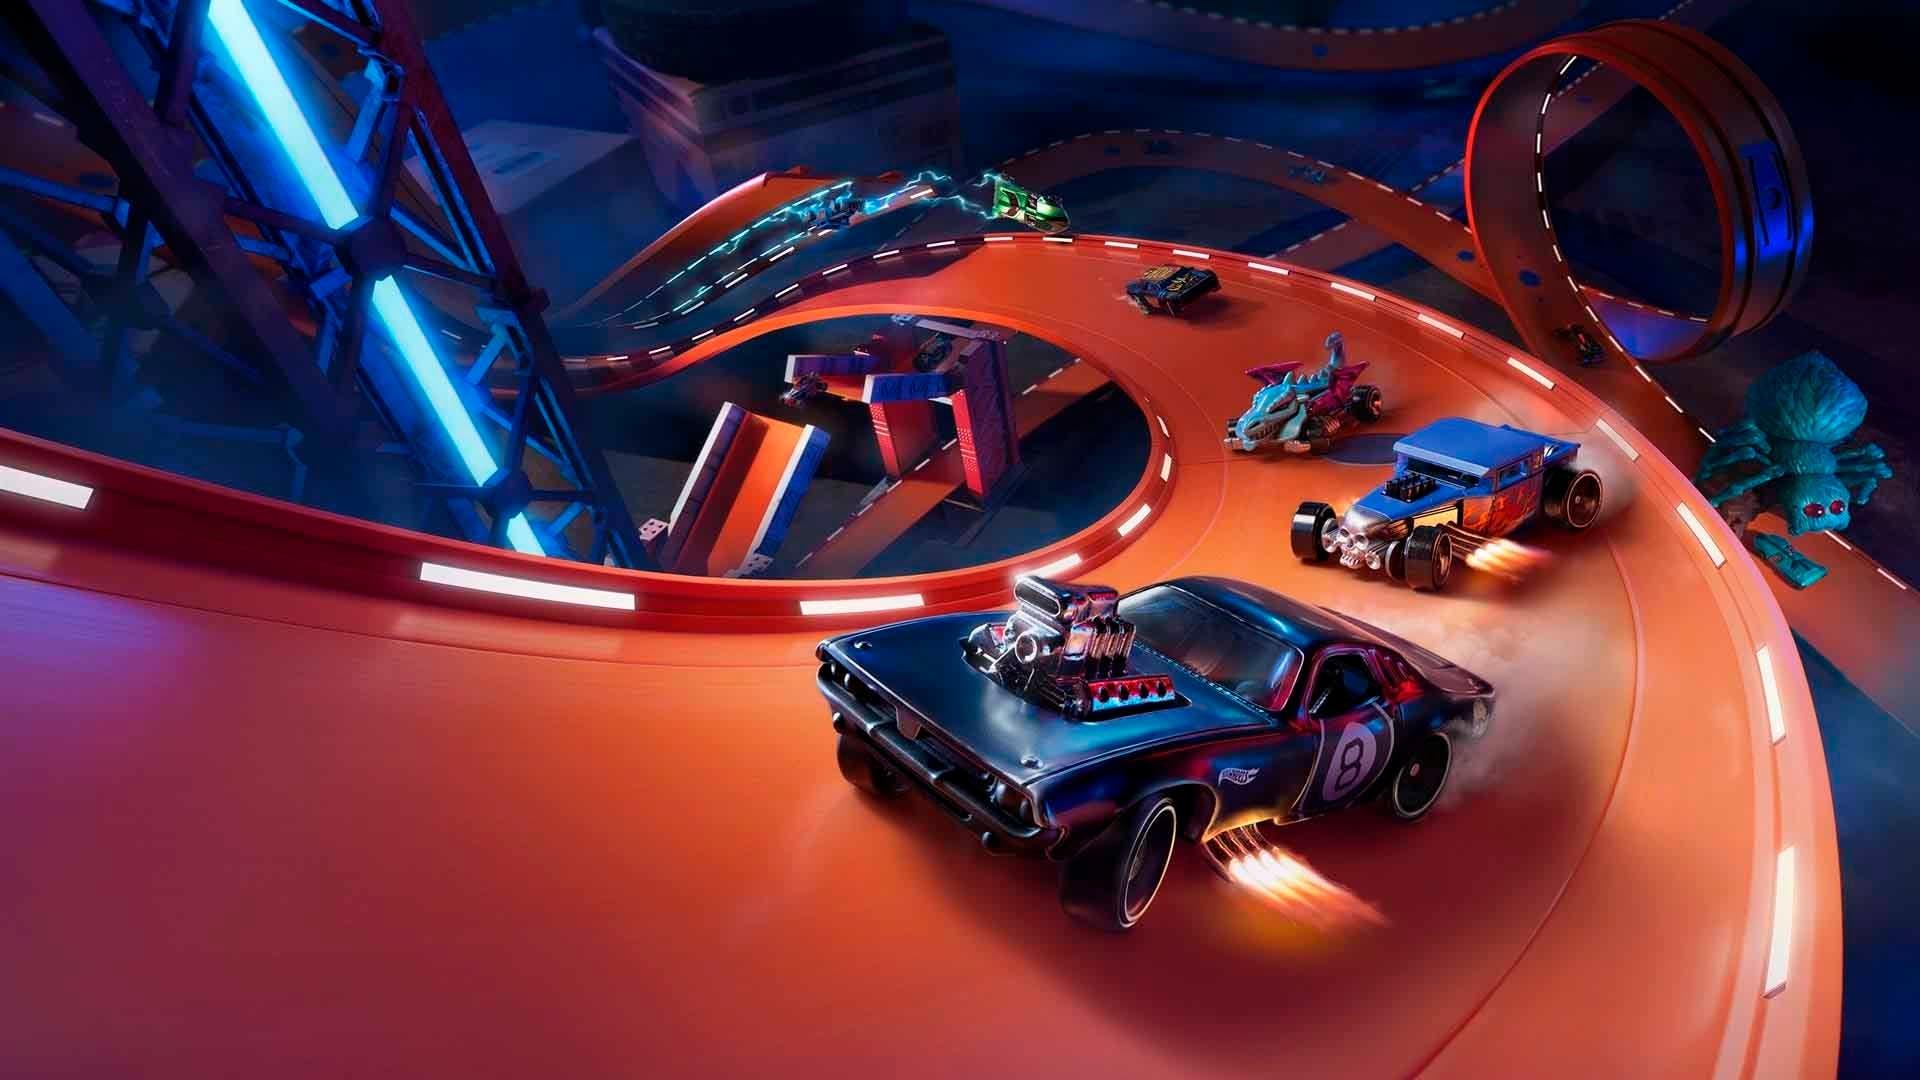 Análisis de Hot Wheels Unleashed - Xbox Series X 8